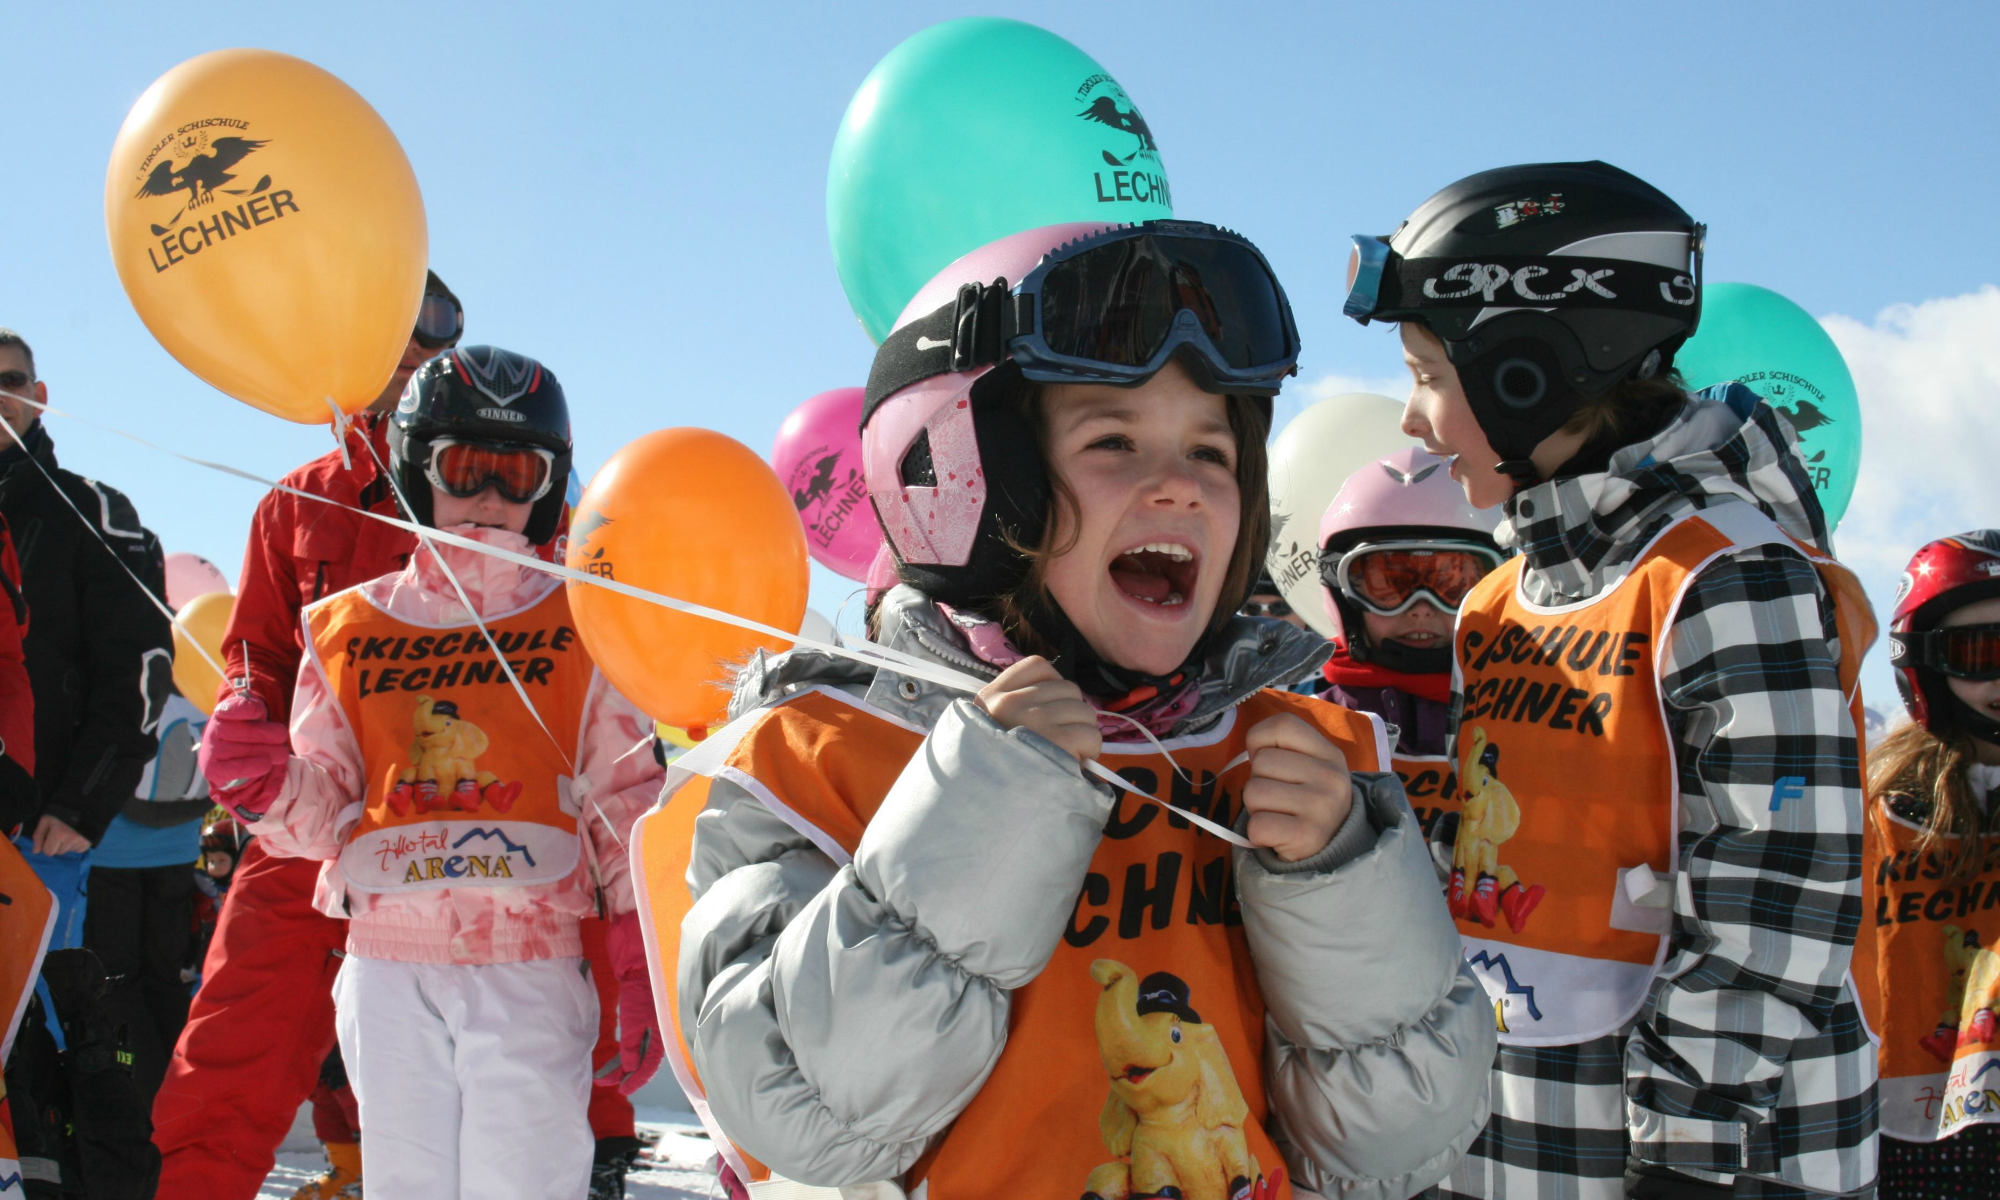 Children in the kid's area ArenaFuntenland in Zell am Ziller, holding balloons in their hands.